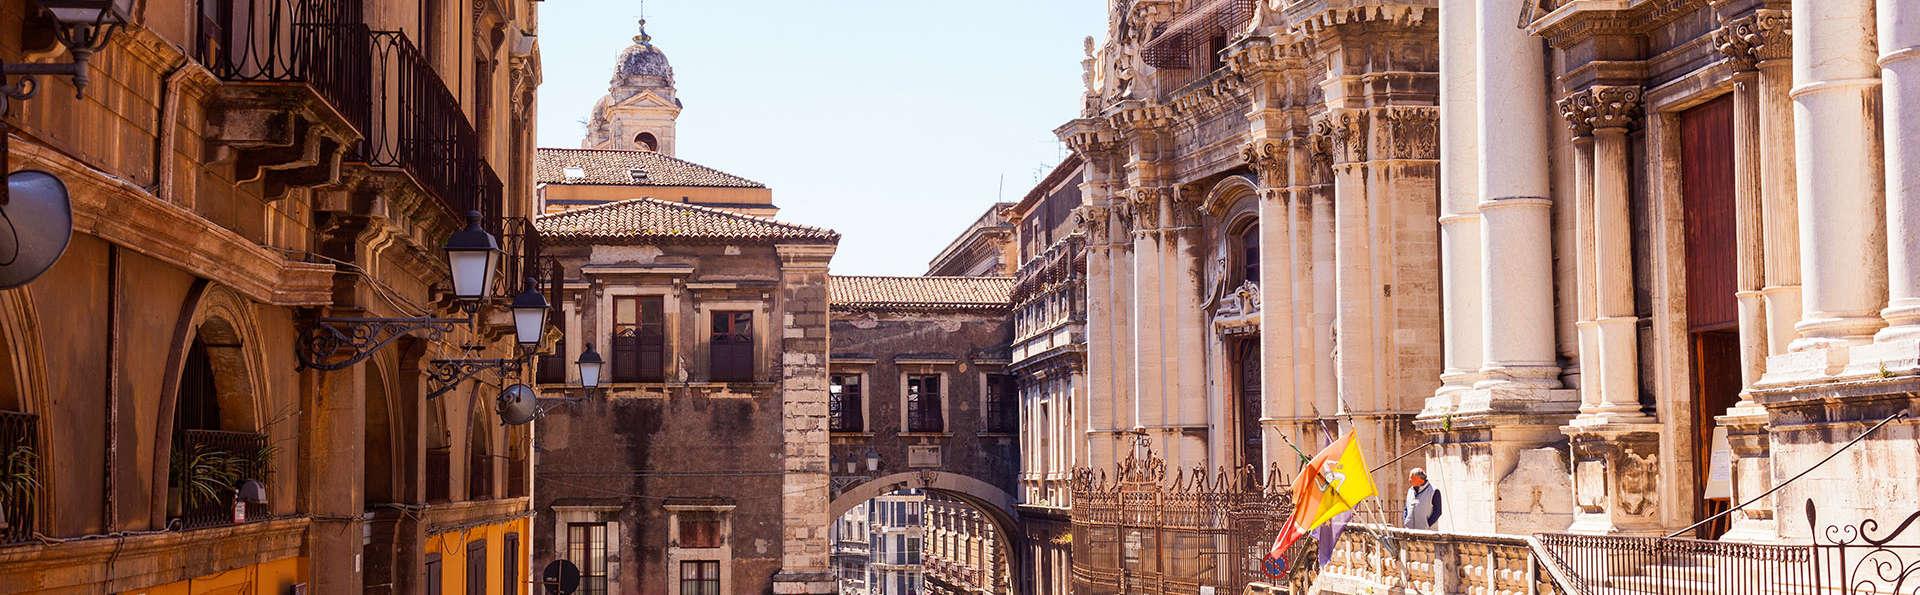 Hotel Royal Catania - EDIT_destination1.jpg